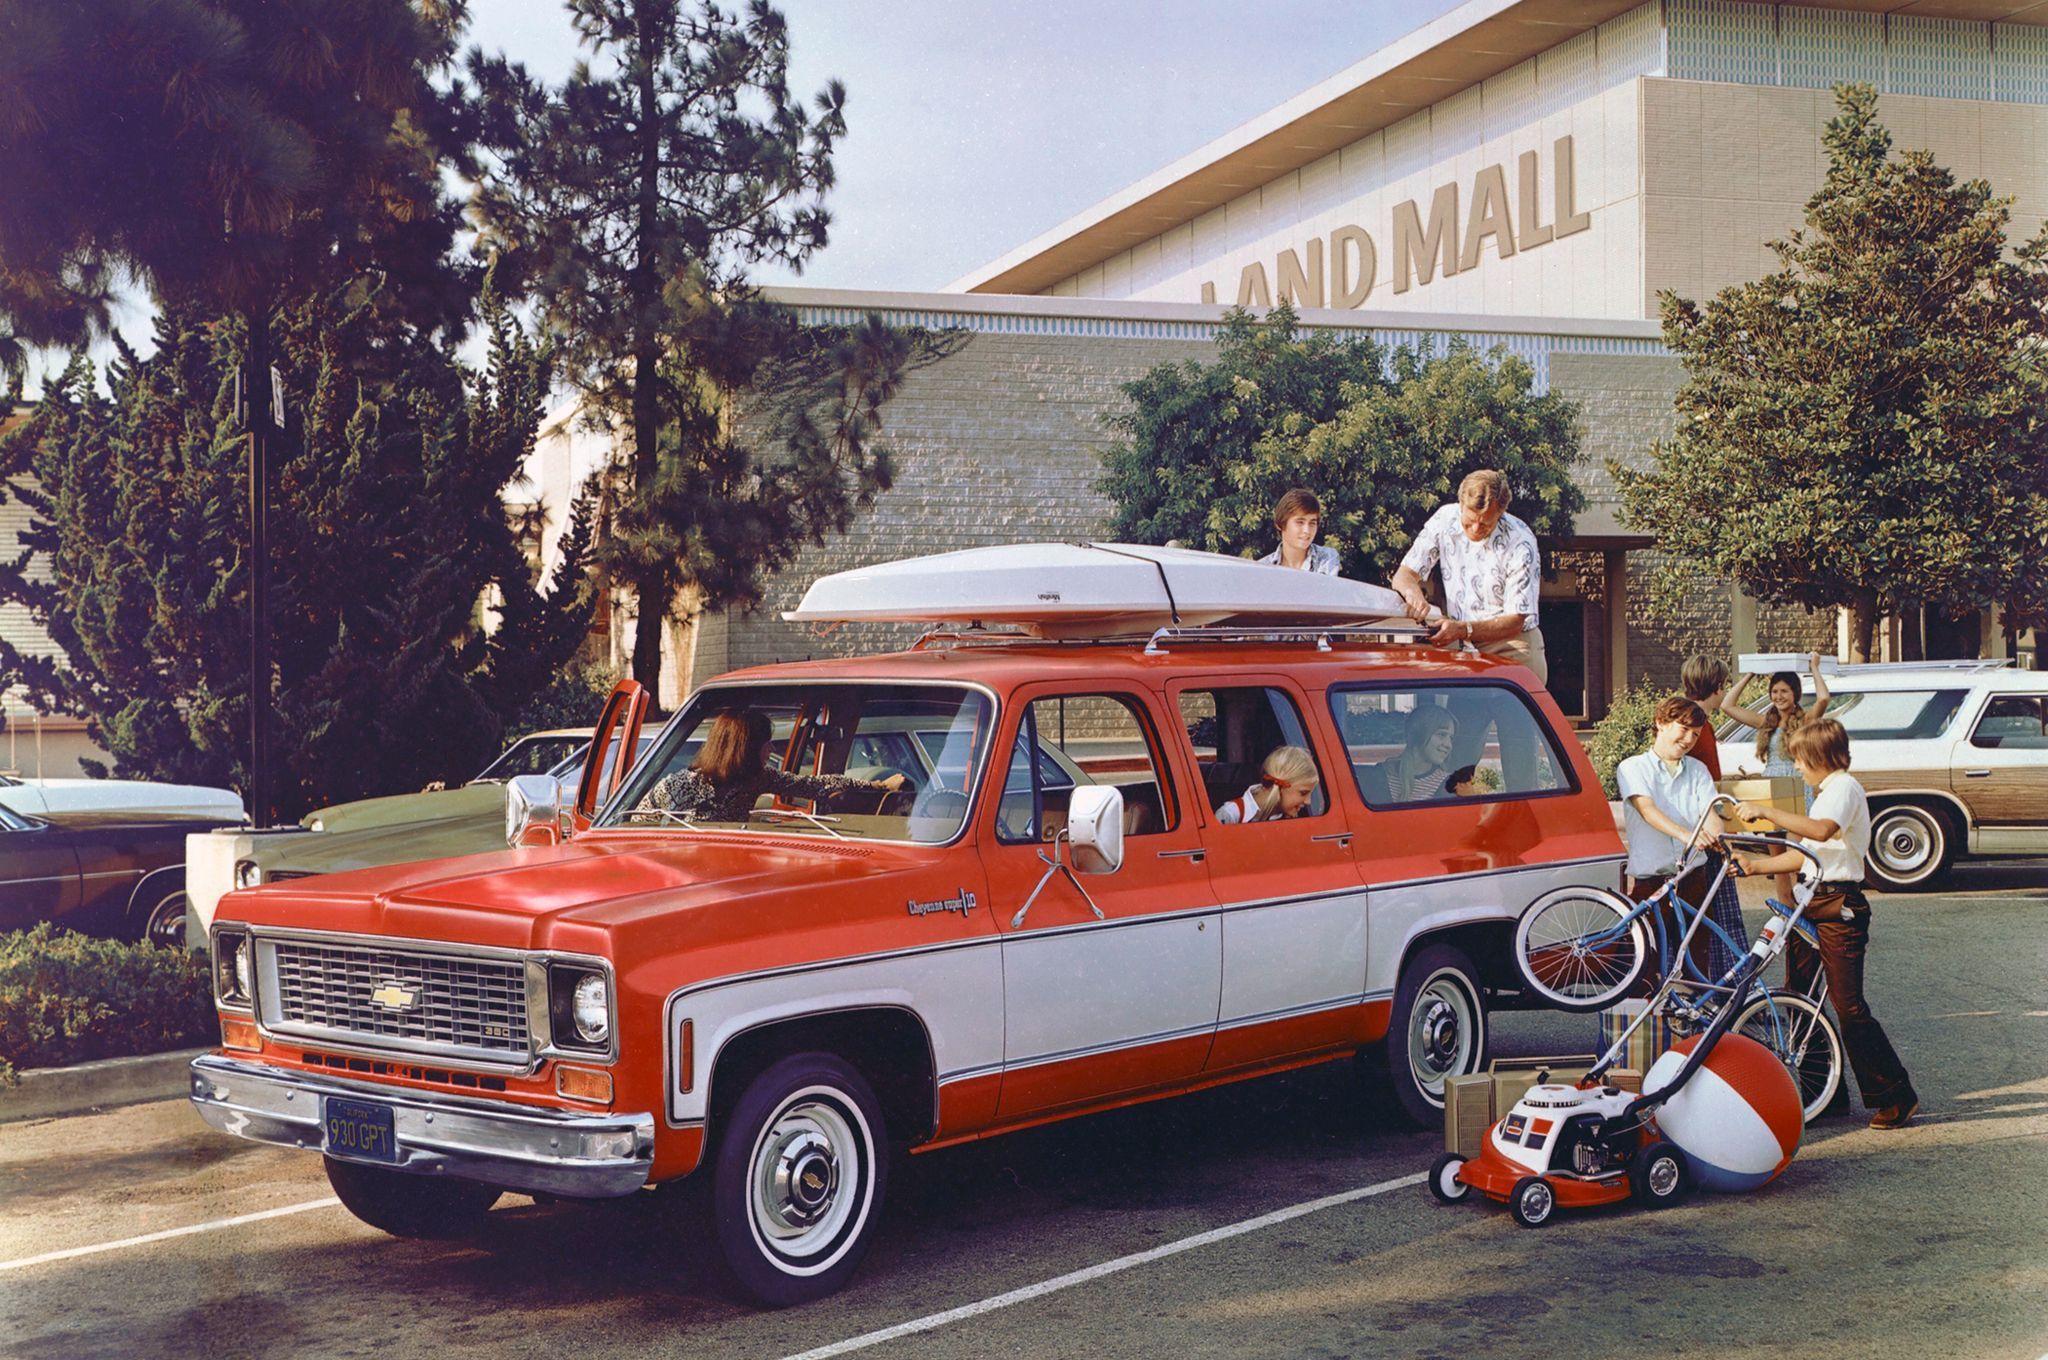 1974 Chevrolet Suburban 350 Ad Pic Suburban